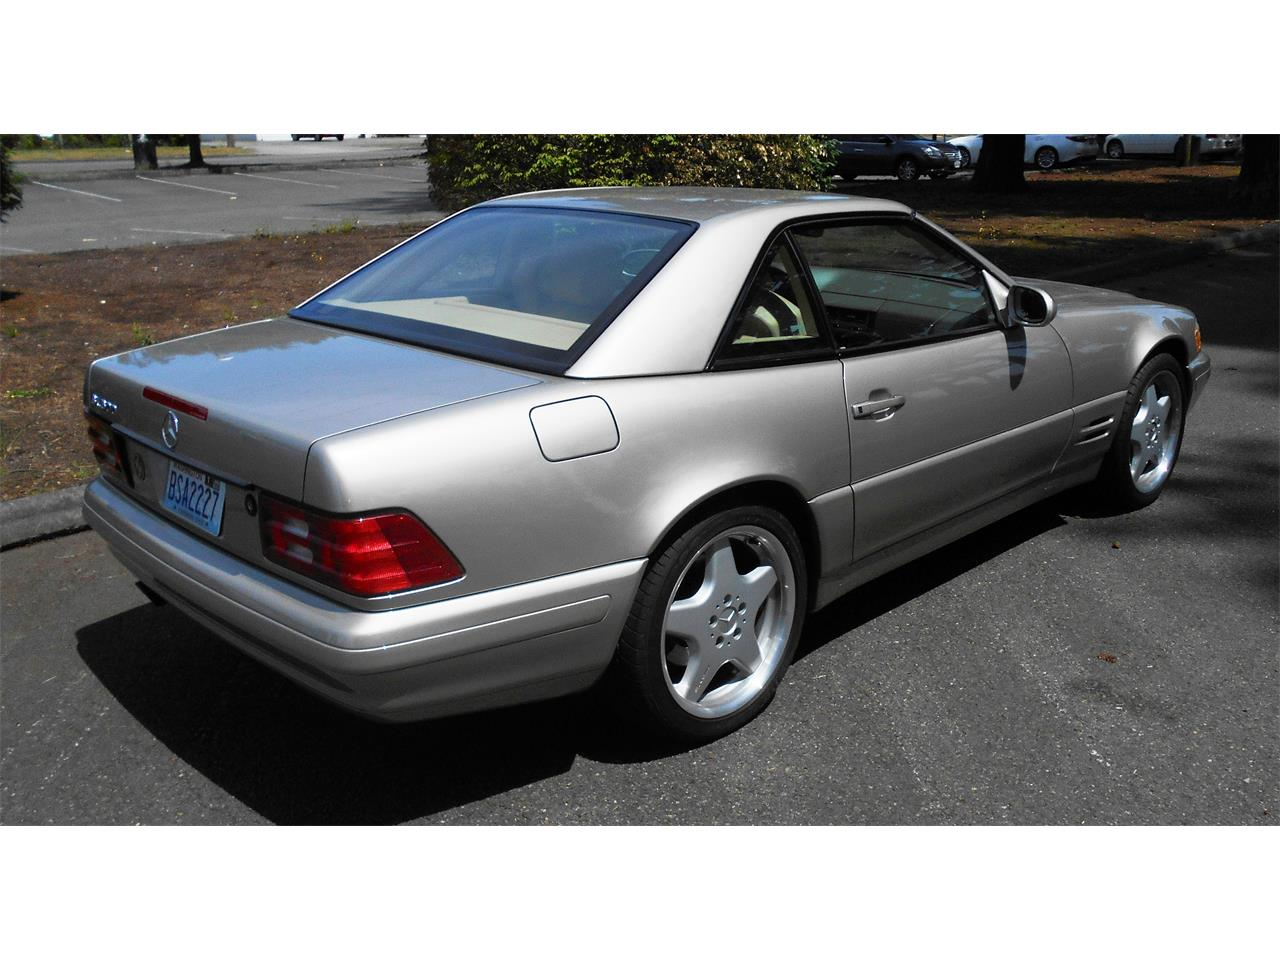 1999 Mercedes-Benz SL500 (CC-1360052) for sale in Tacoma, Washington